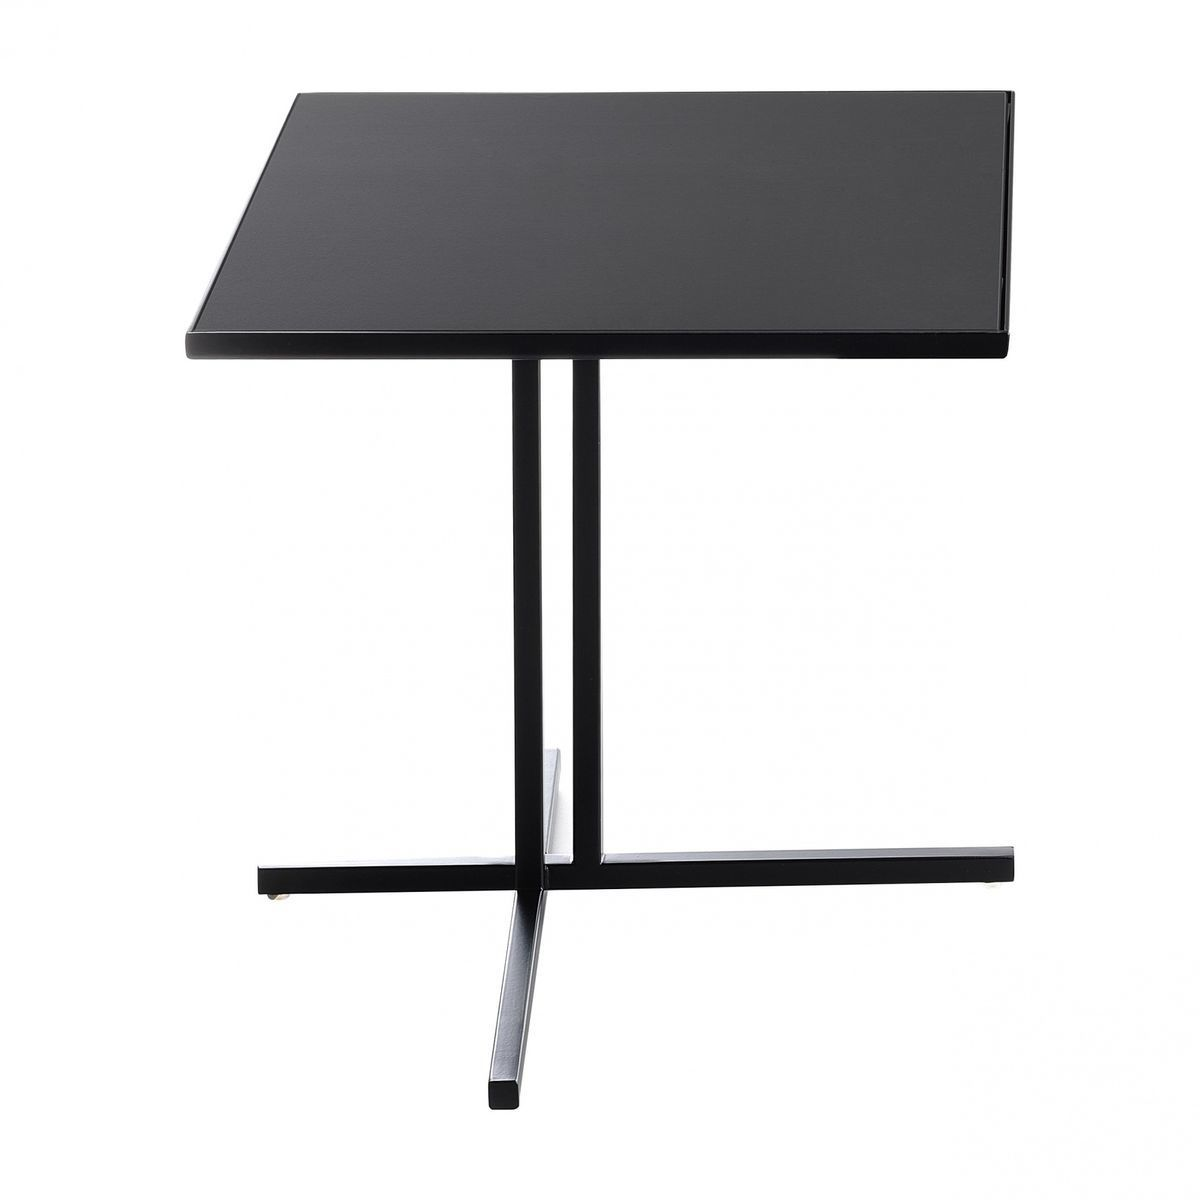 k table side table mdf italia. Black Bedroom Furniture Sets. Home Design Ideas